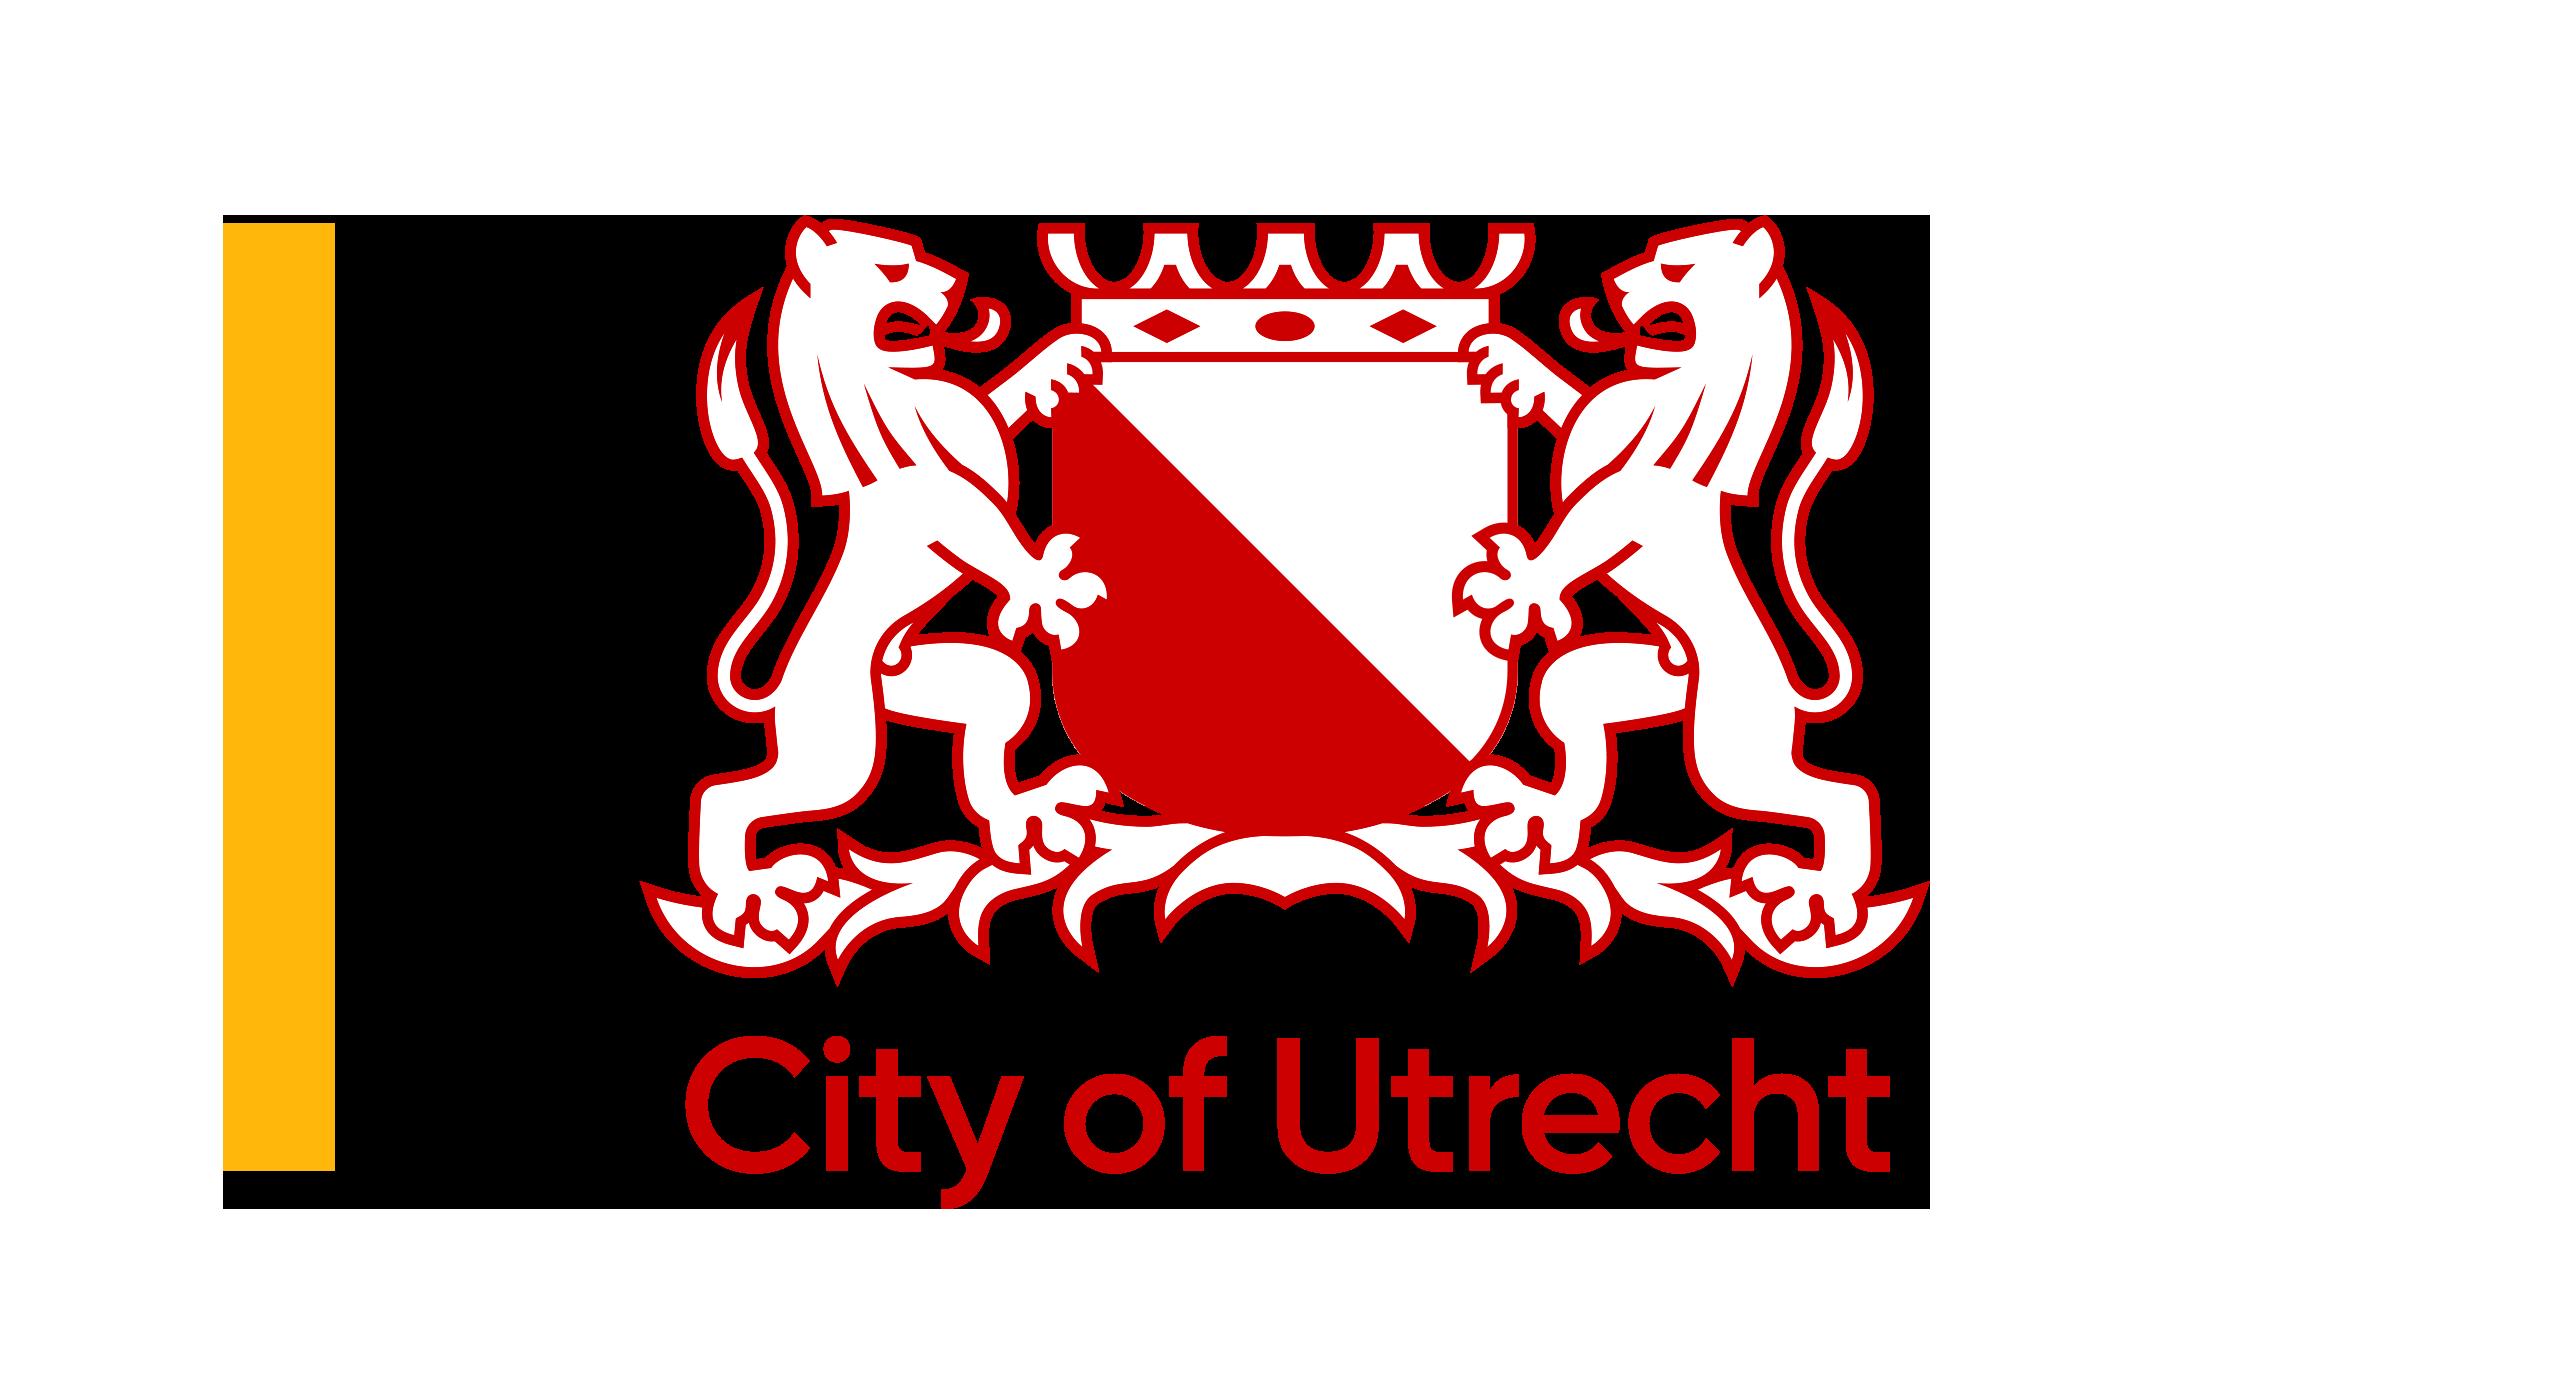 stad utrecht